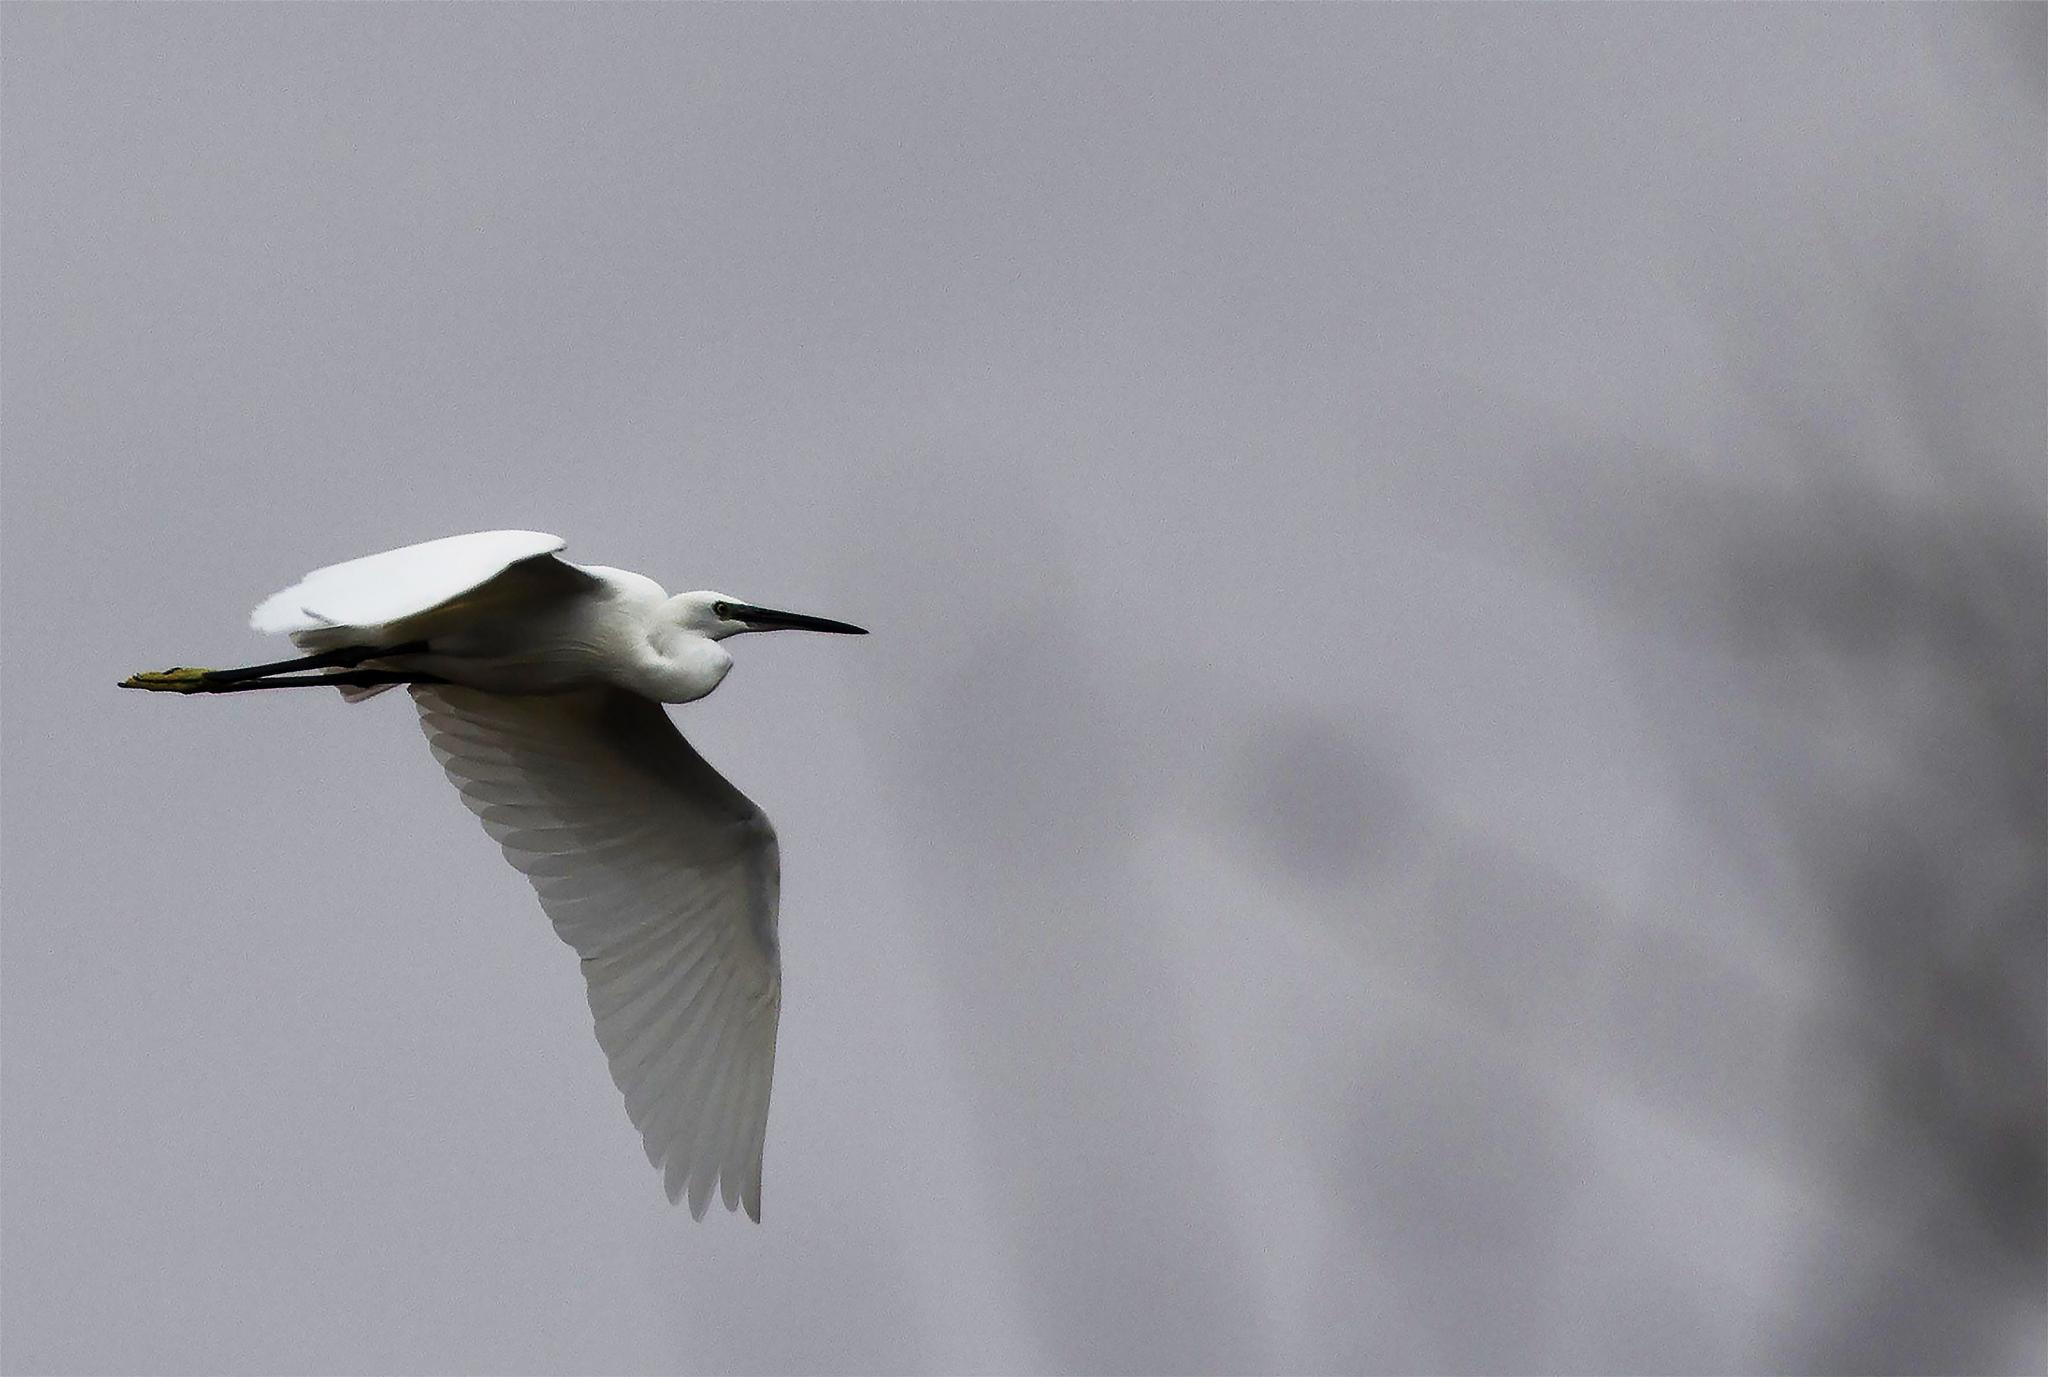 Heron by MaxBSimic